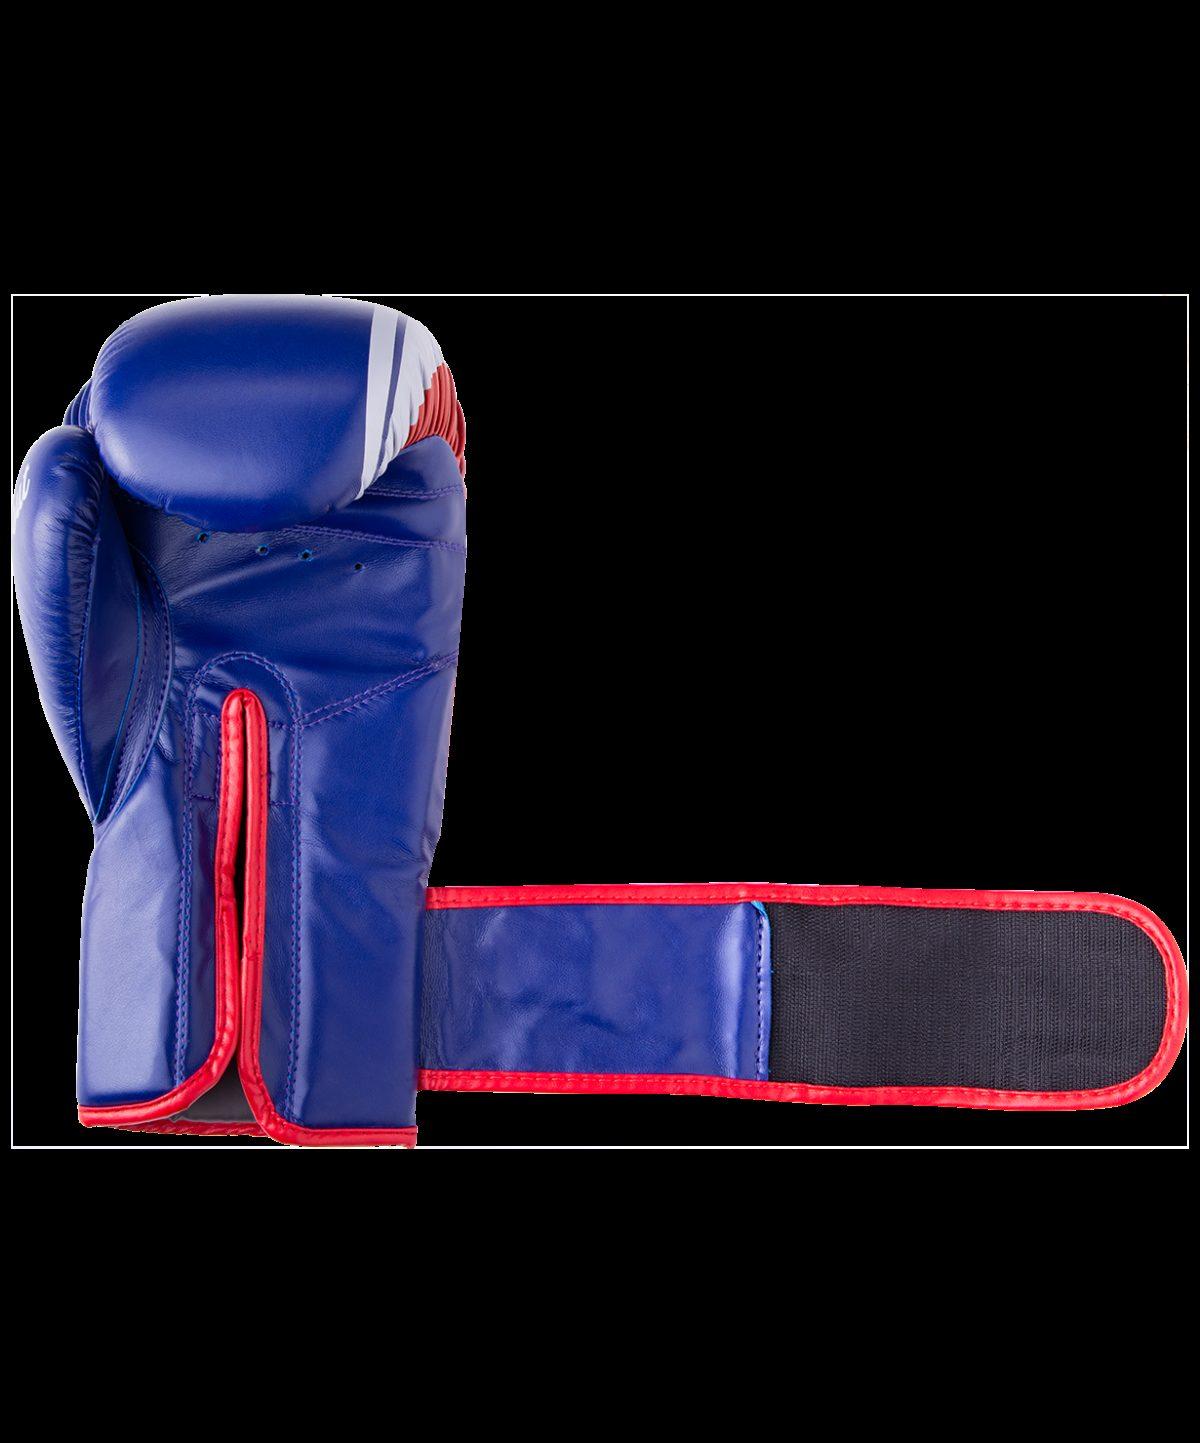 GREEN HILL Перчатки боксерские 10 oz Knockout  BGK-2266: синий - 5